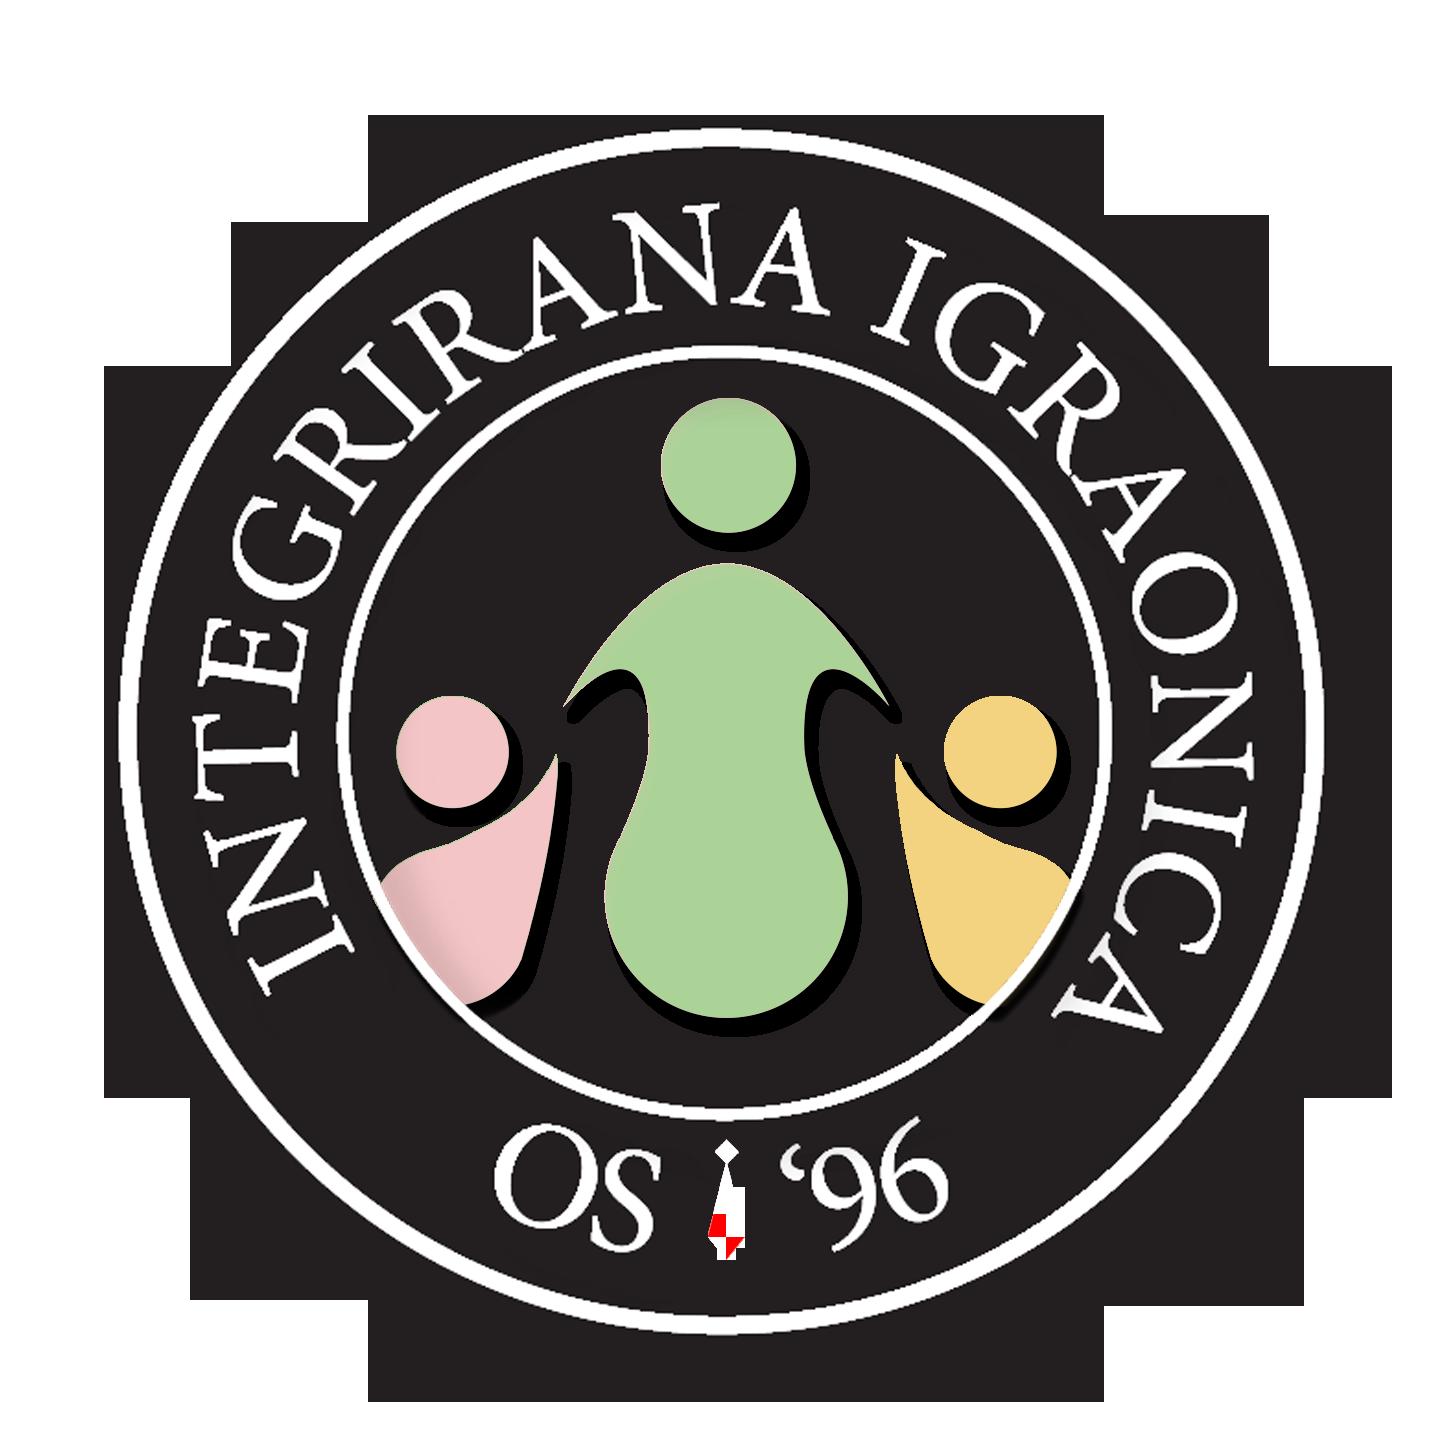 Igraonica logo